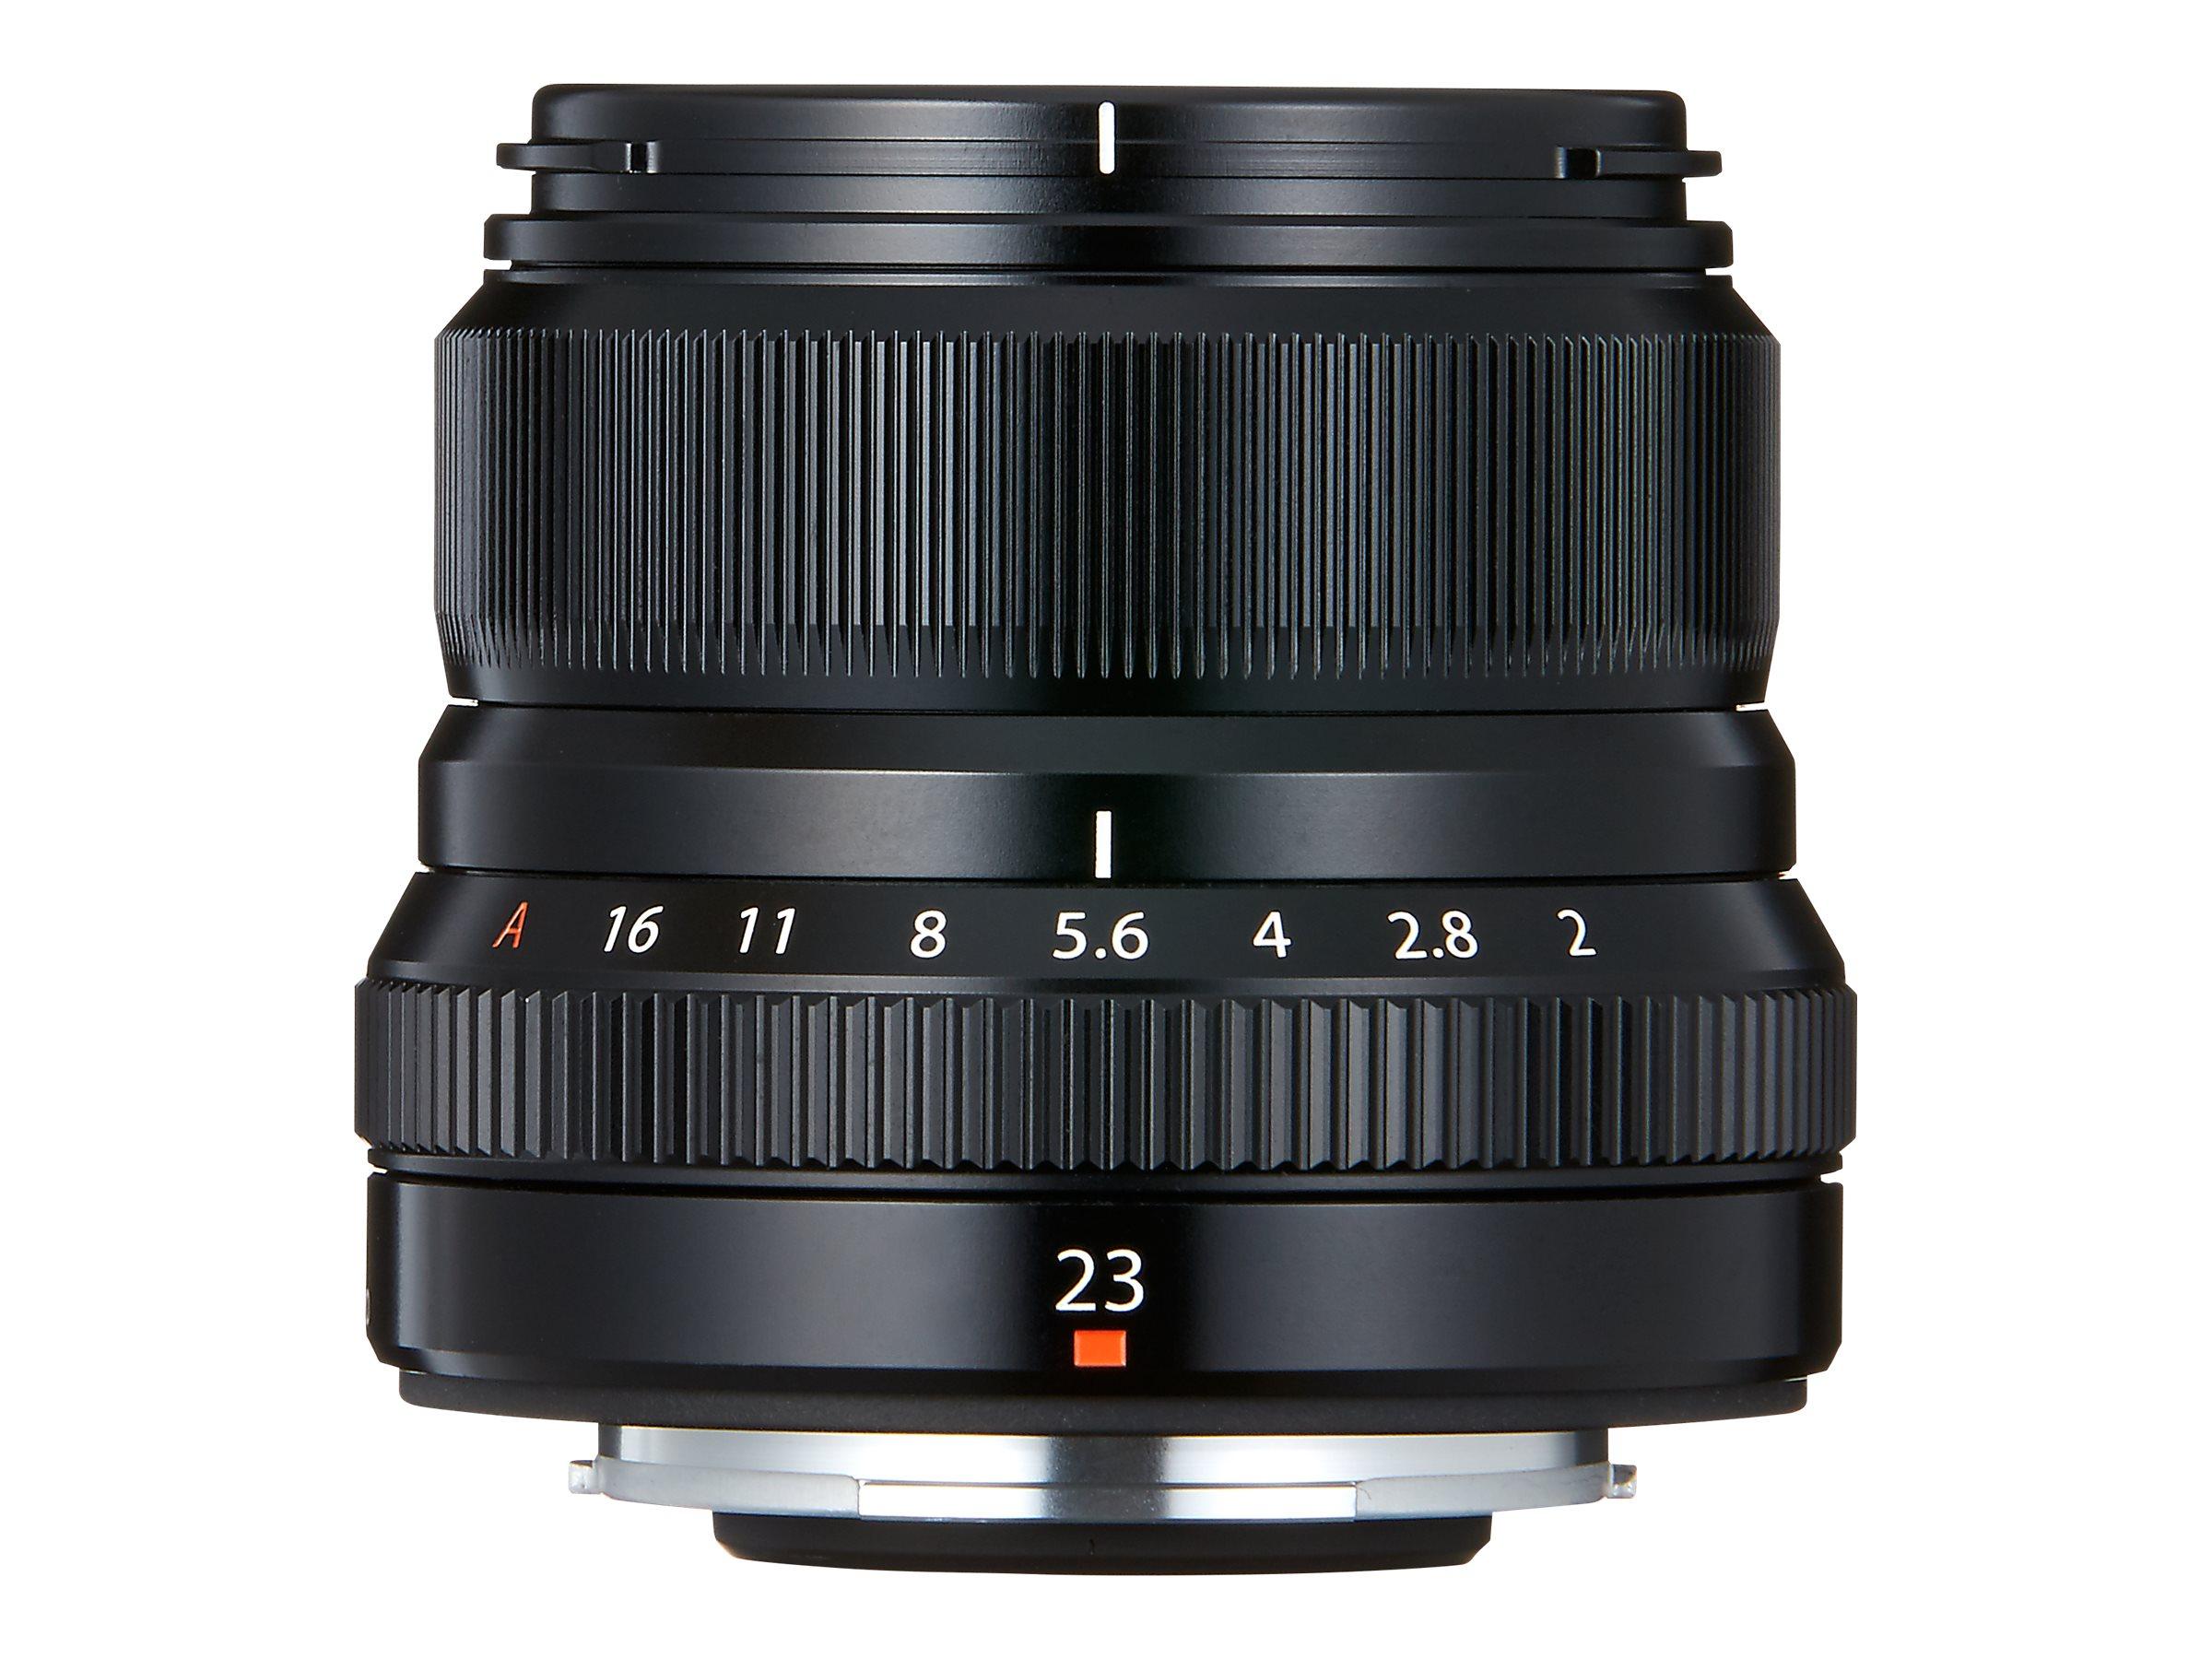 Fujinon XF - Weitwinkelobjektiv - 23 mm - f/2.0 R WR - Fujifilm X Mount - für X Series X-A10, X-A5, X-E3, X-H1, X-T100, X-T3, X-